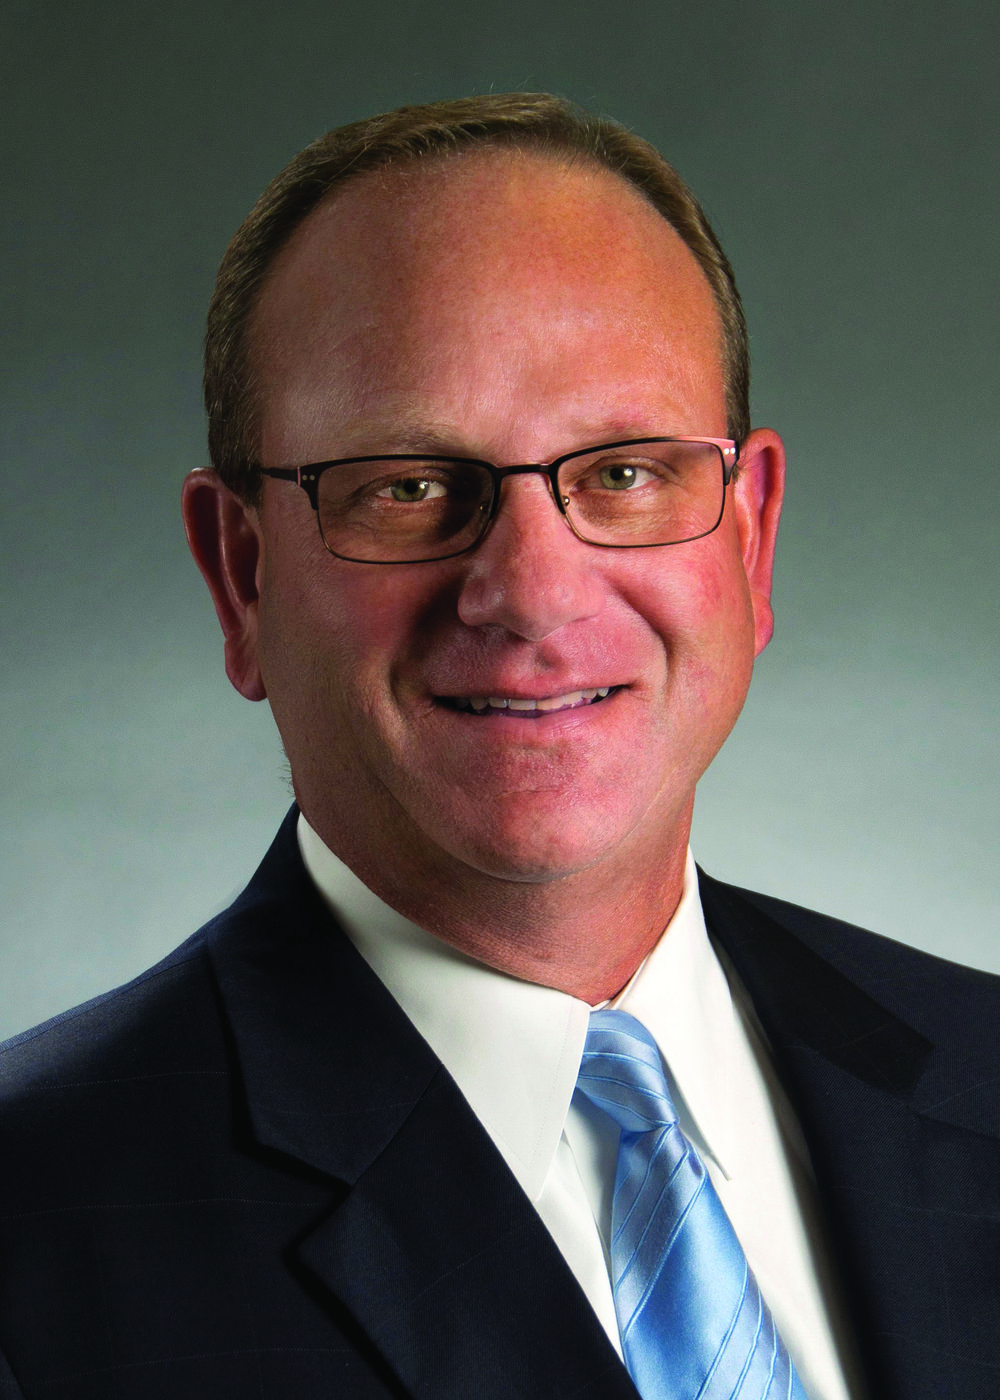 Dr. Todd White, Blue Valley Schools Superintendent